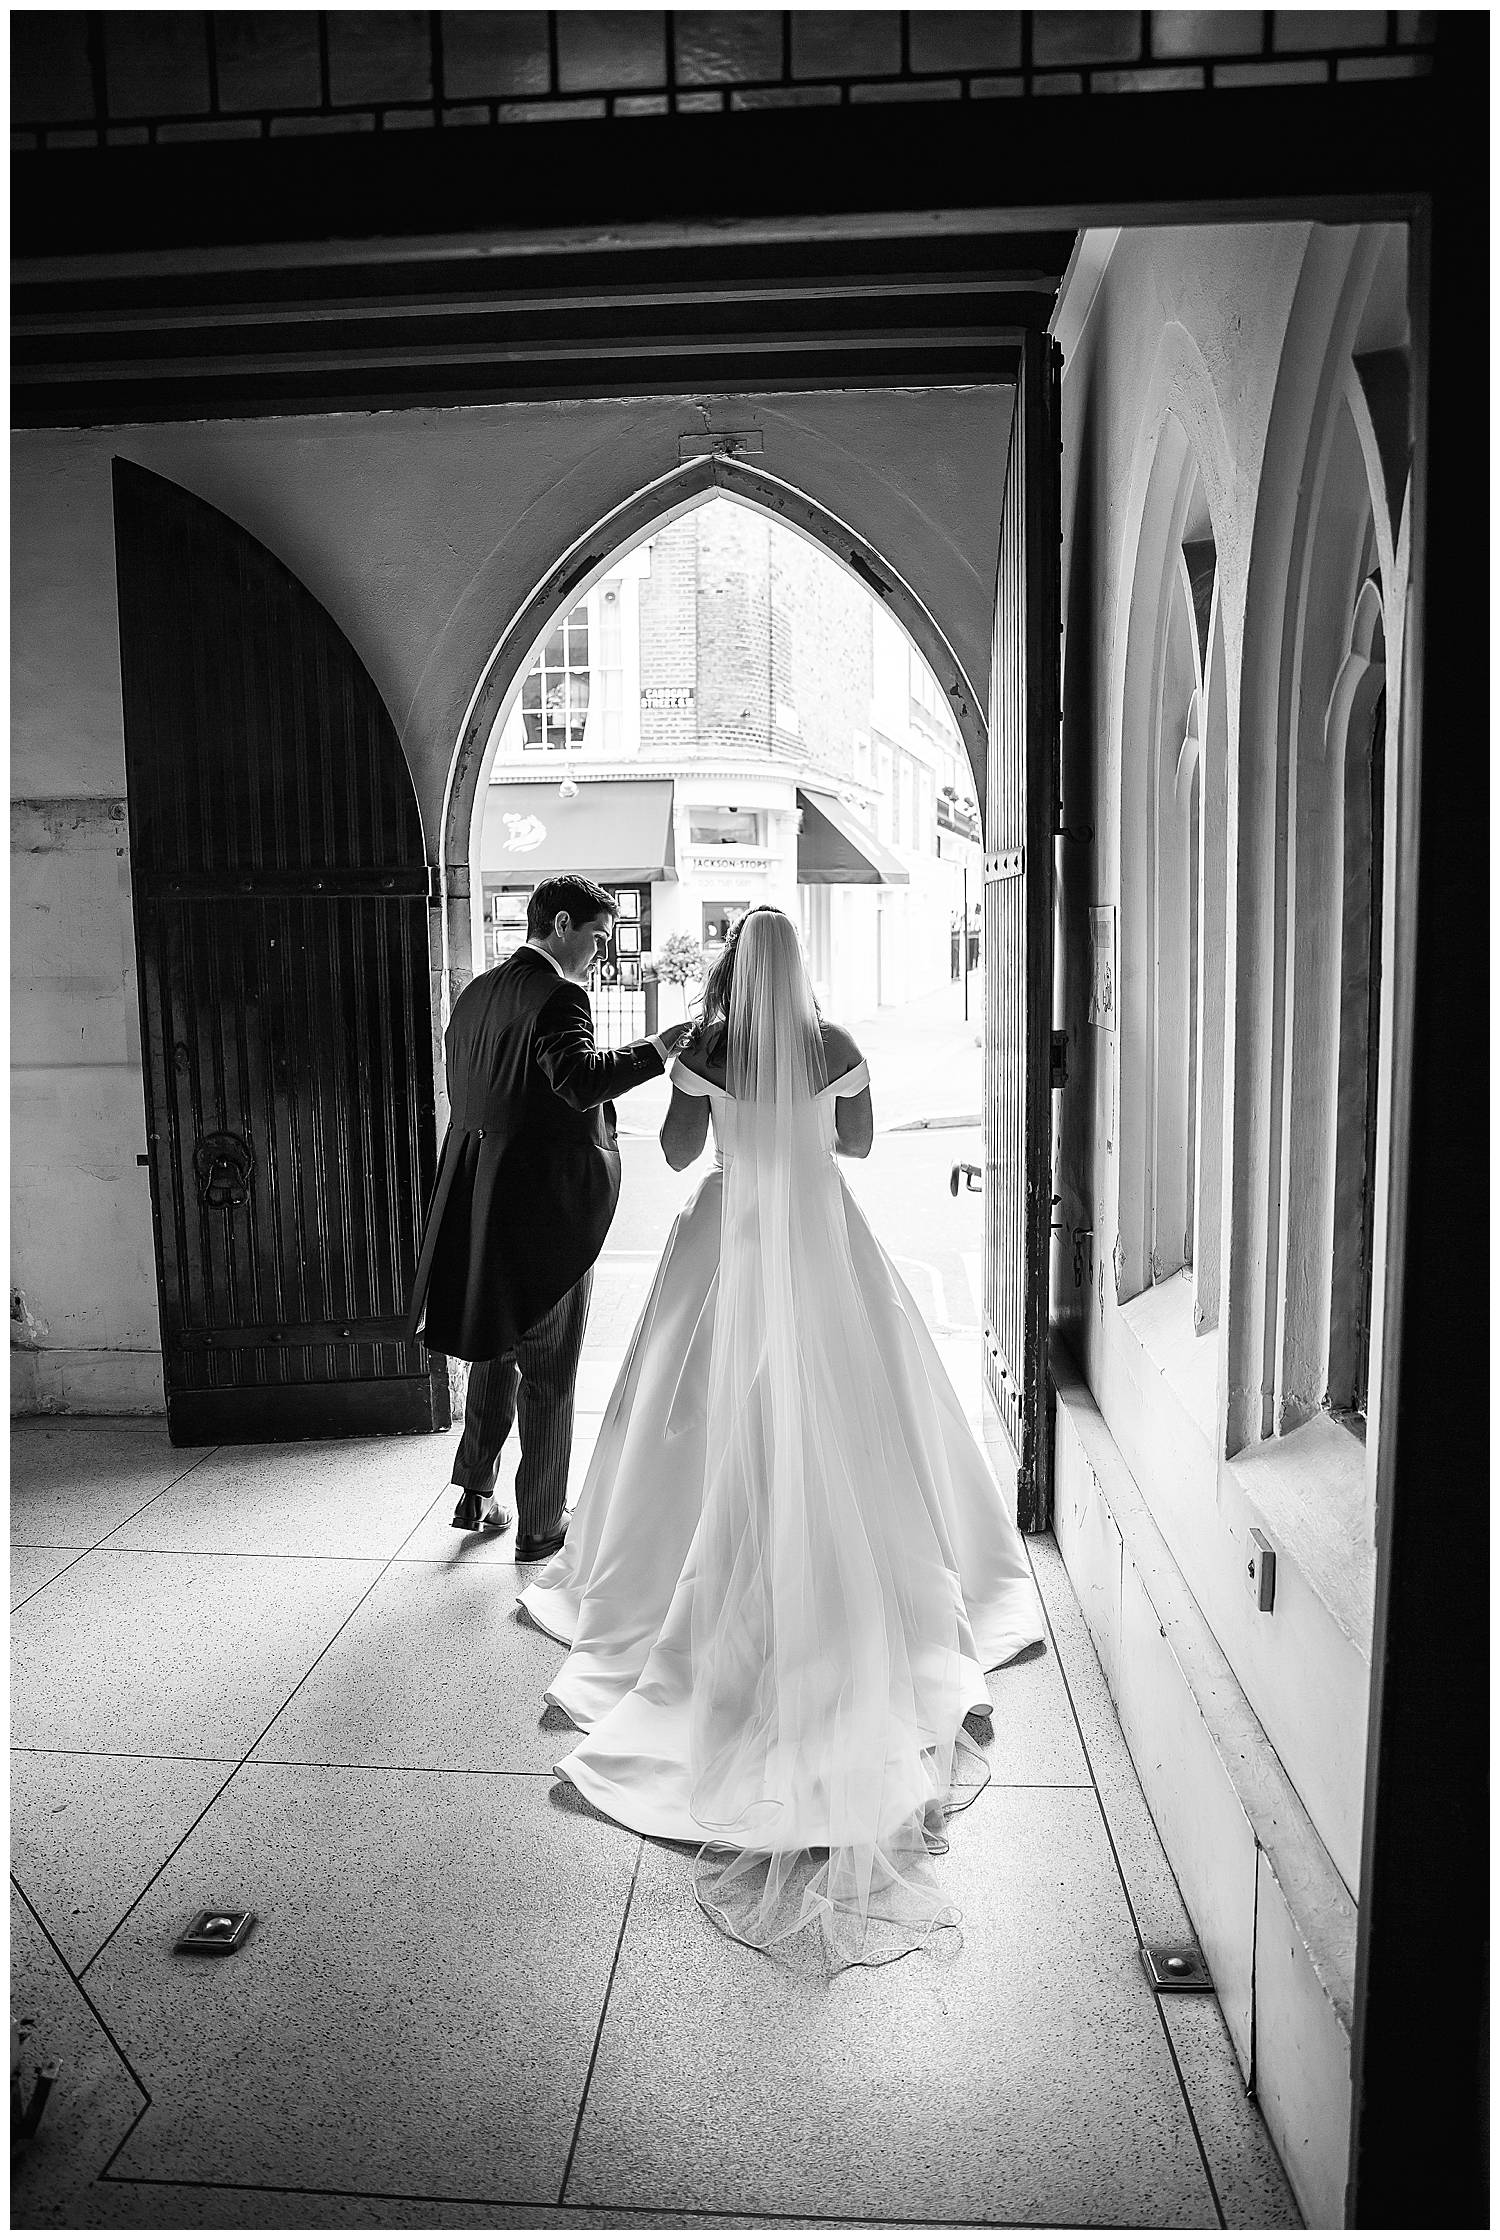 leaving wedding at St Mary's Cadogan Street SW3